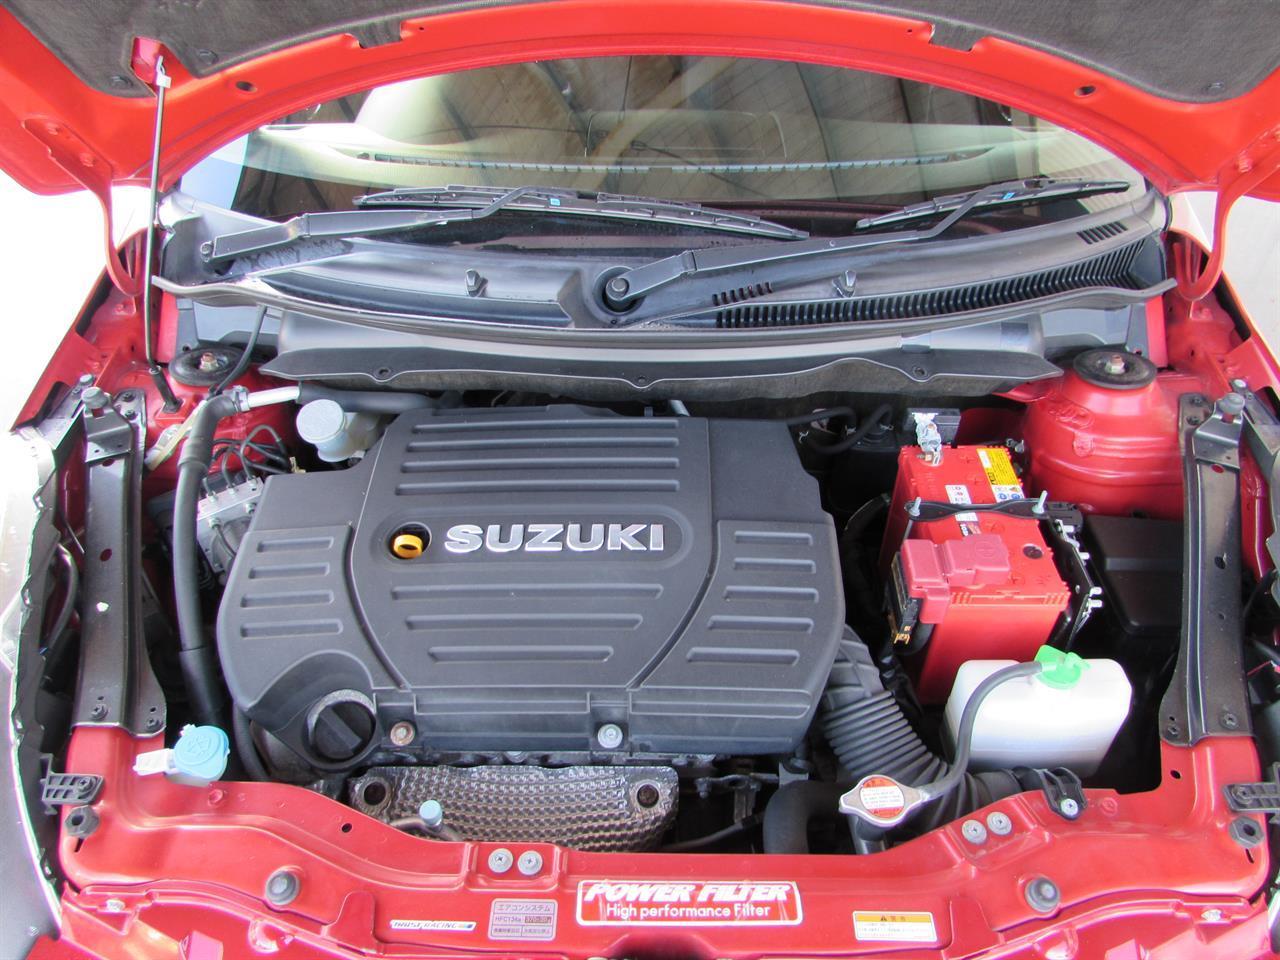 image-14, 2014 Suzuki SWIFT SPORTS at Christchurch